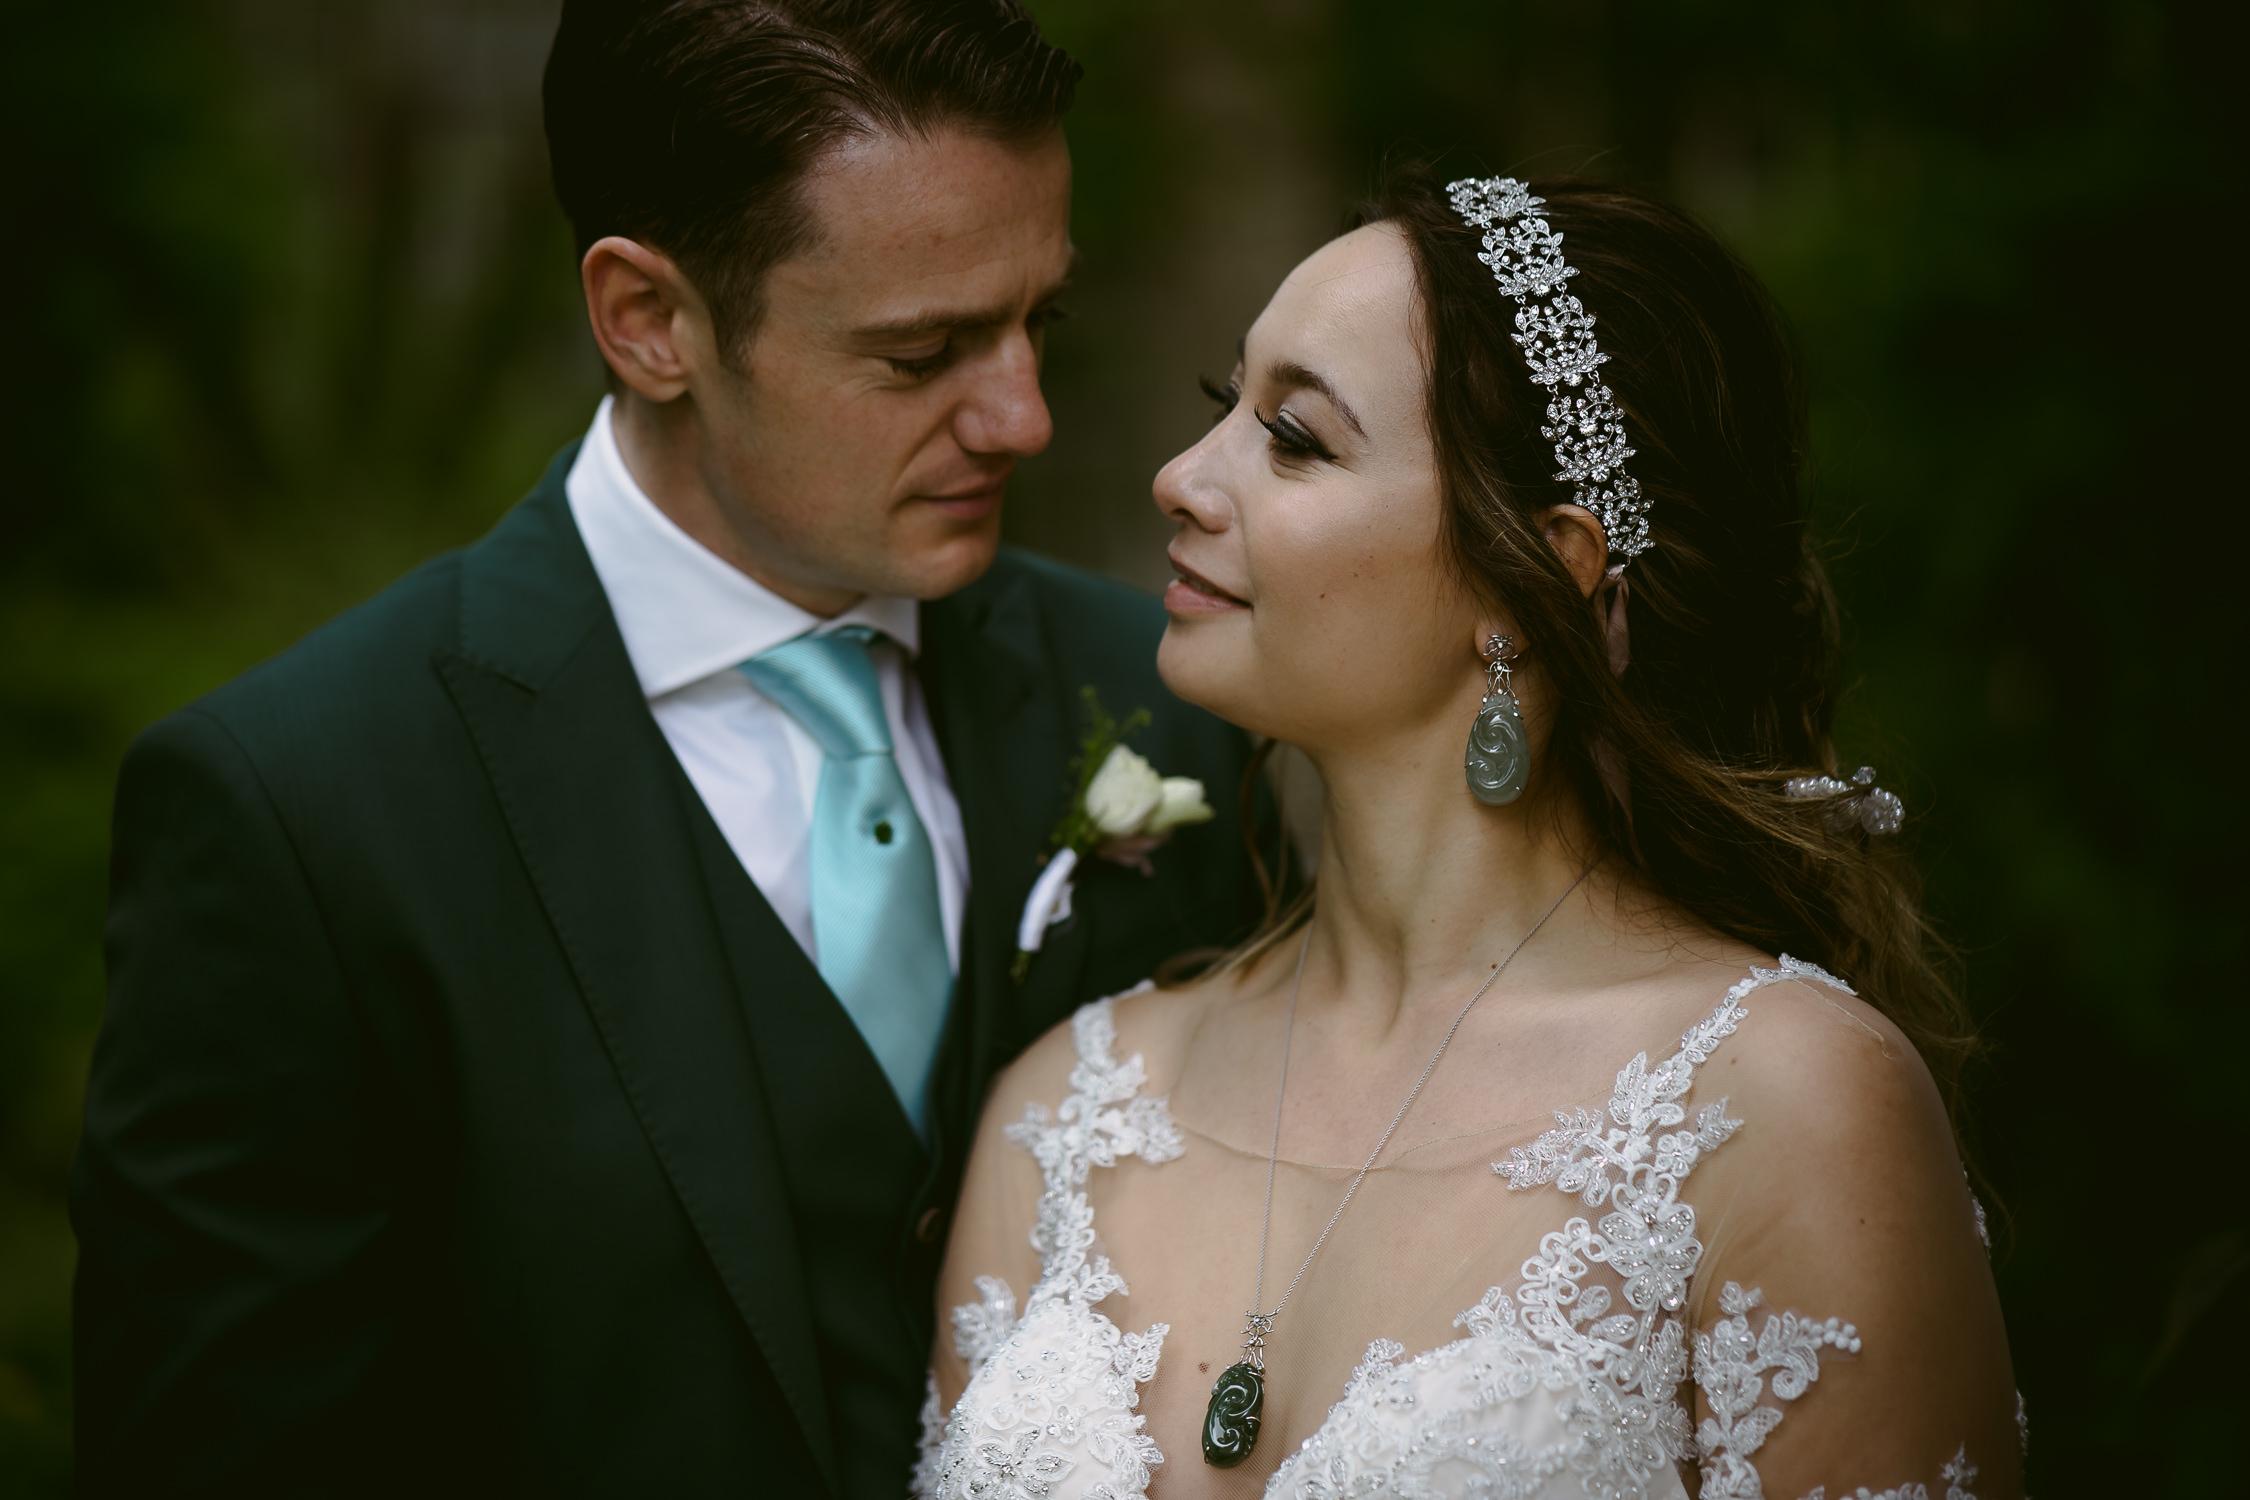 romantic wedding photography amsterdam hortus botanicus